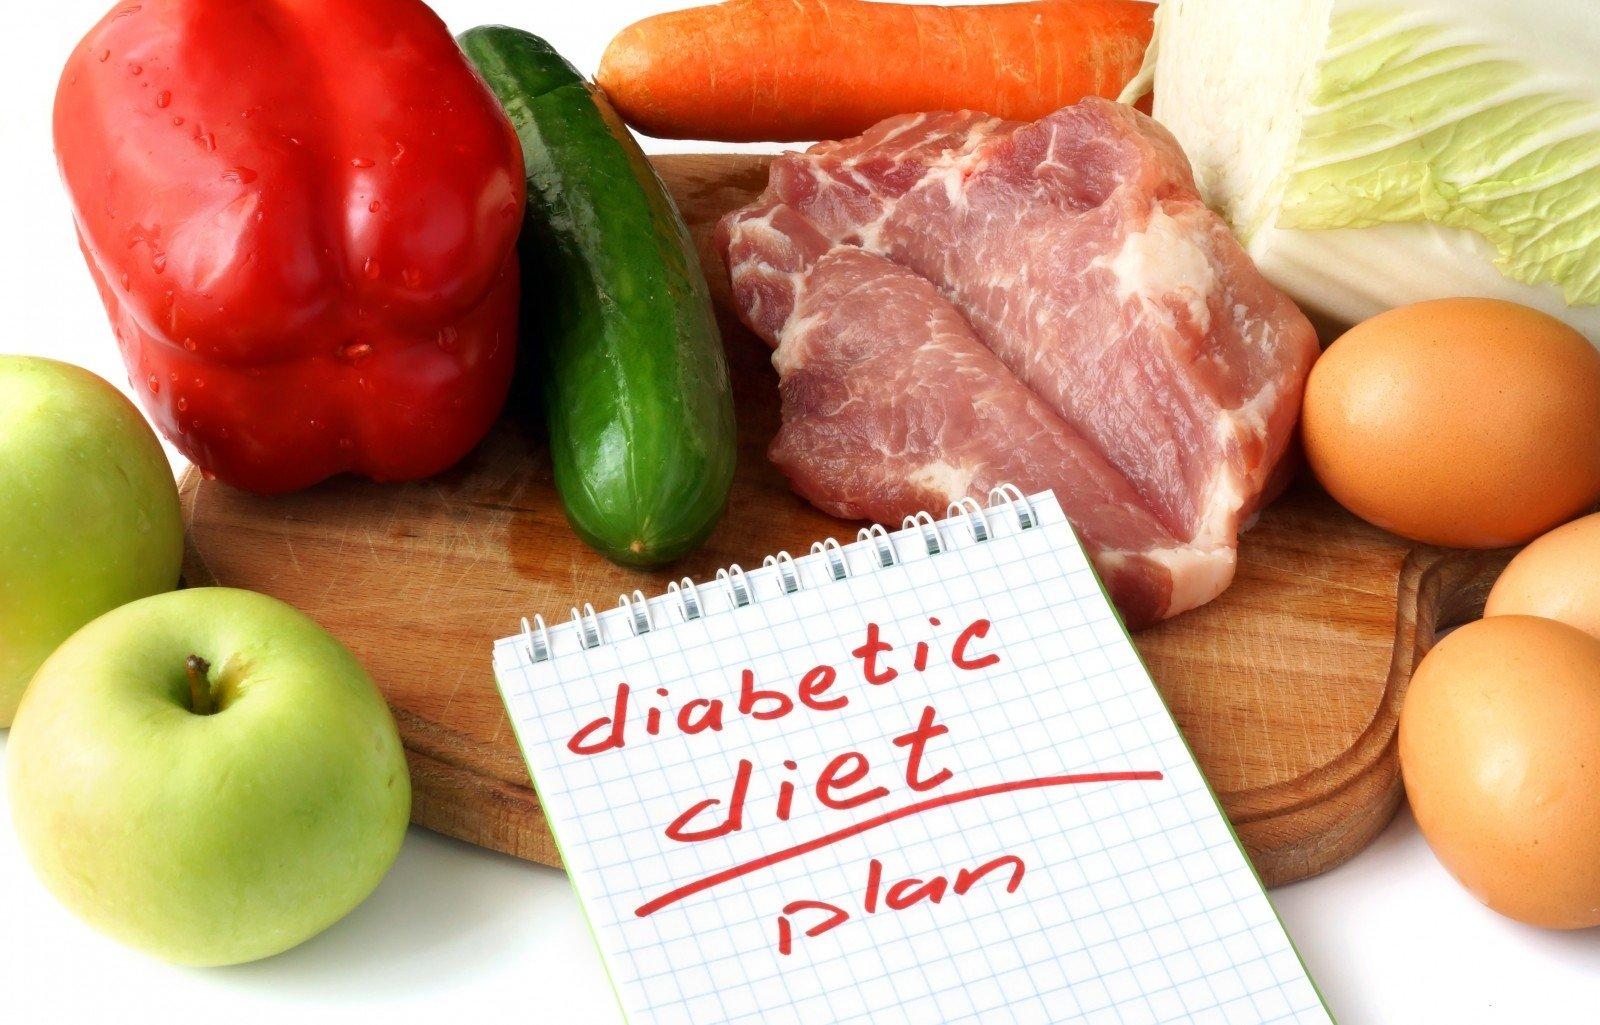 sergant hipertenzija, skiriama dieta)